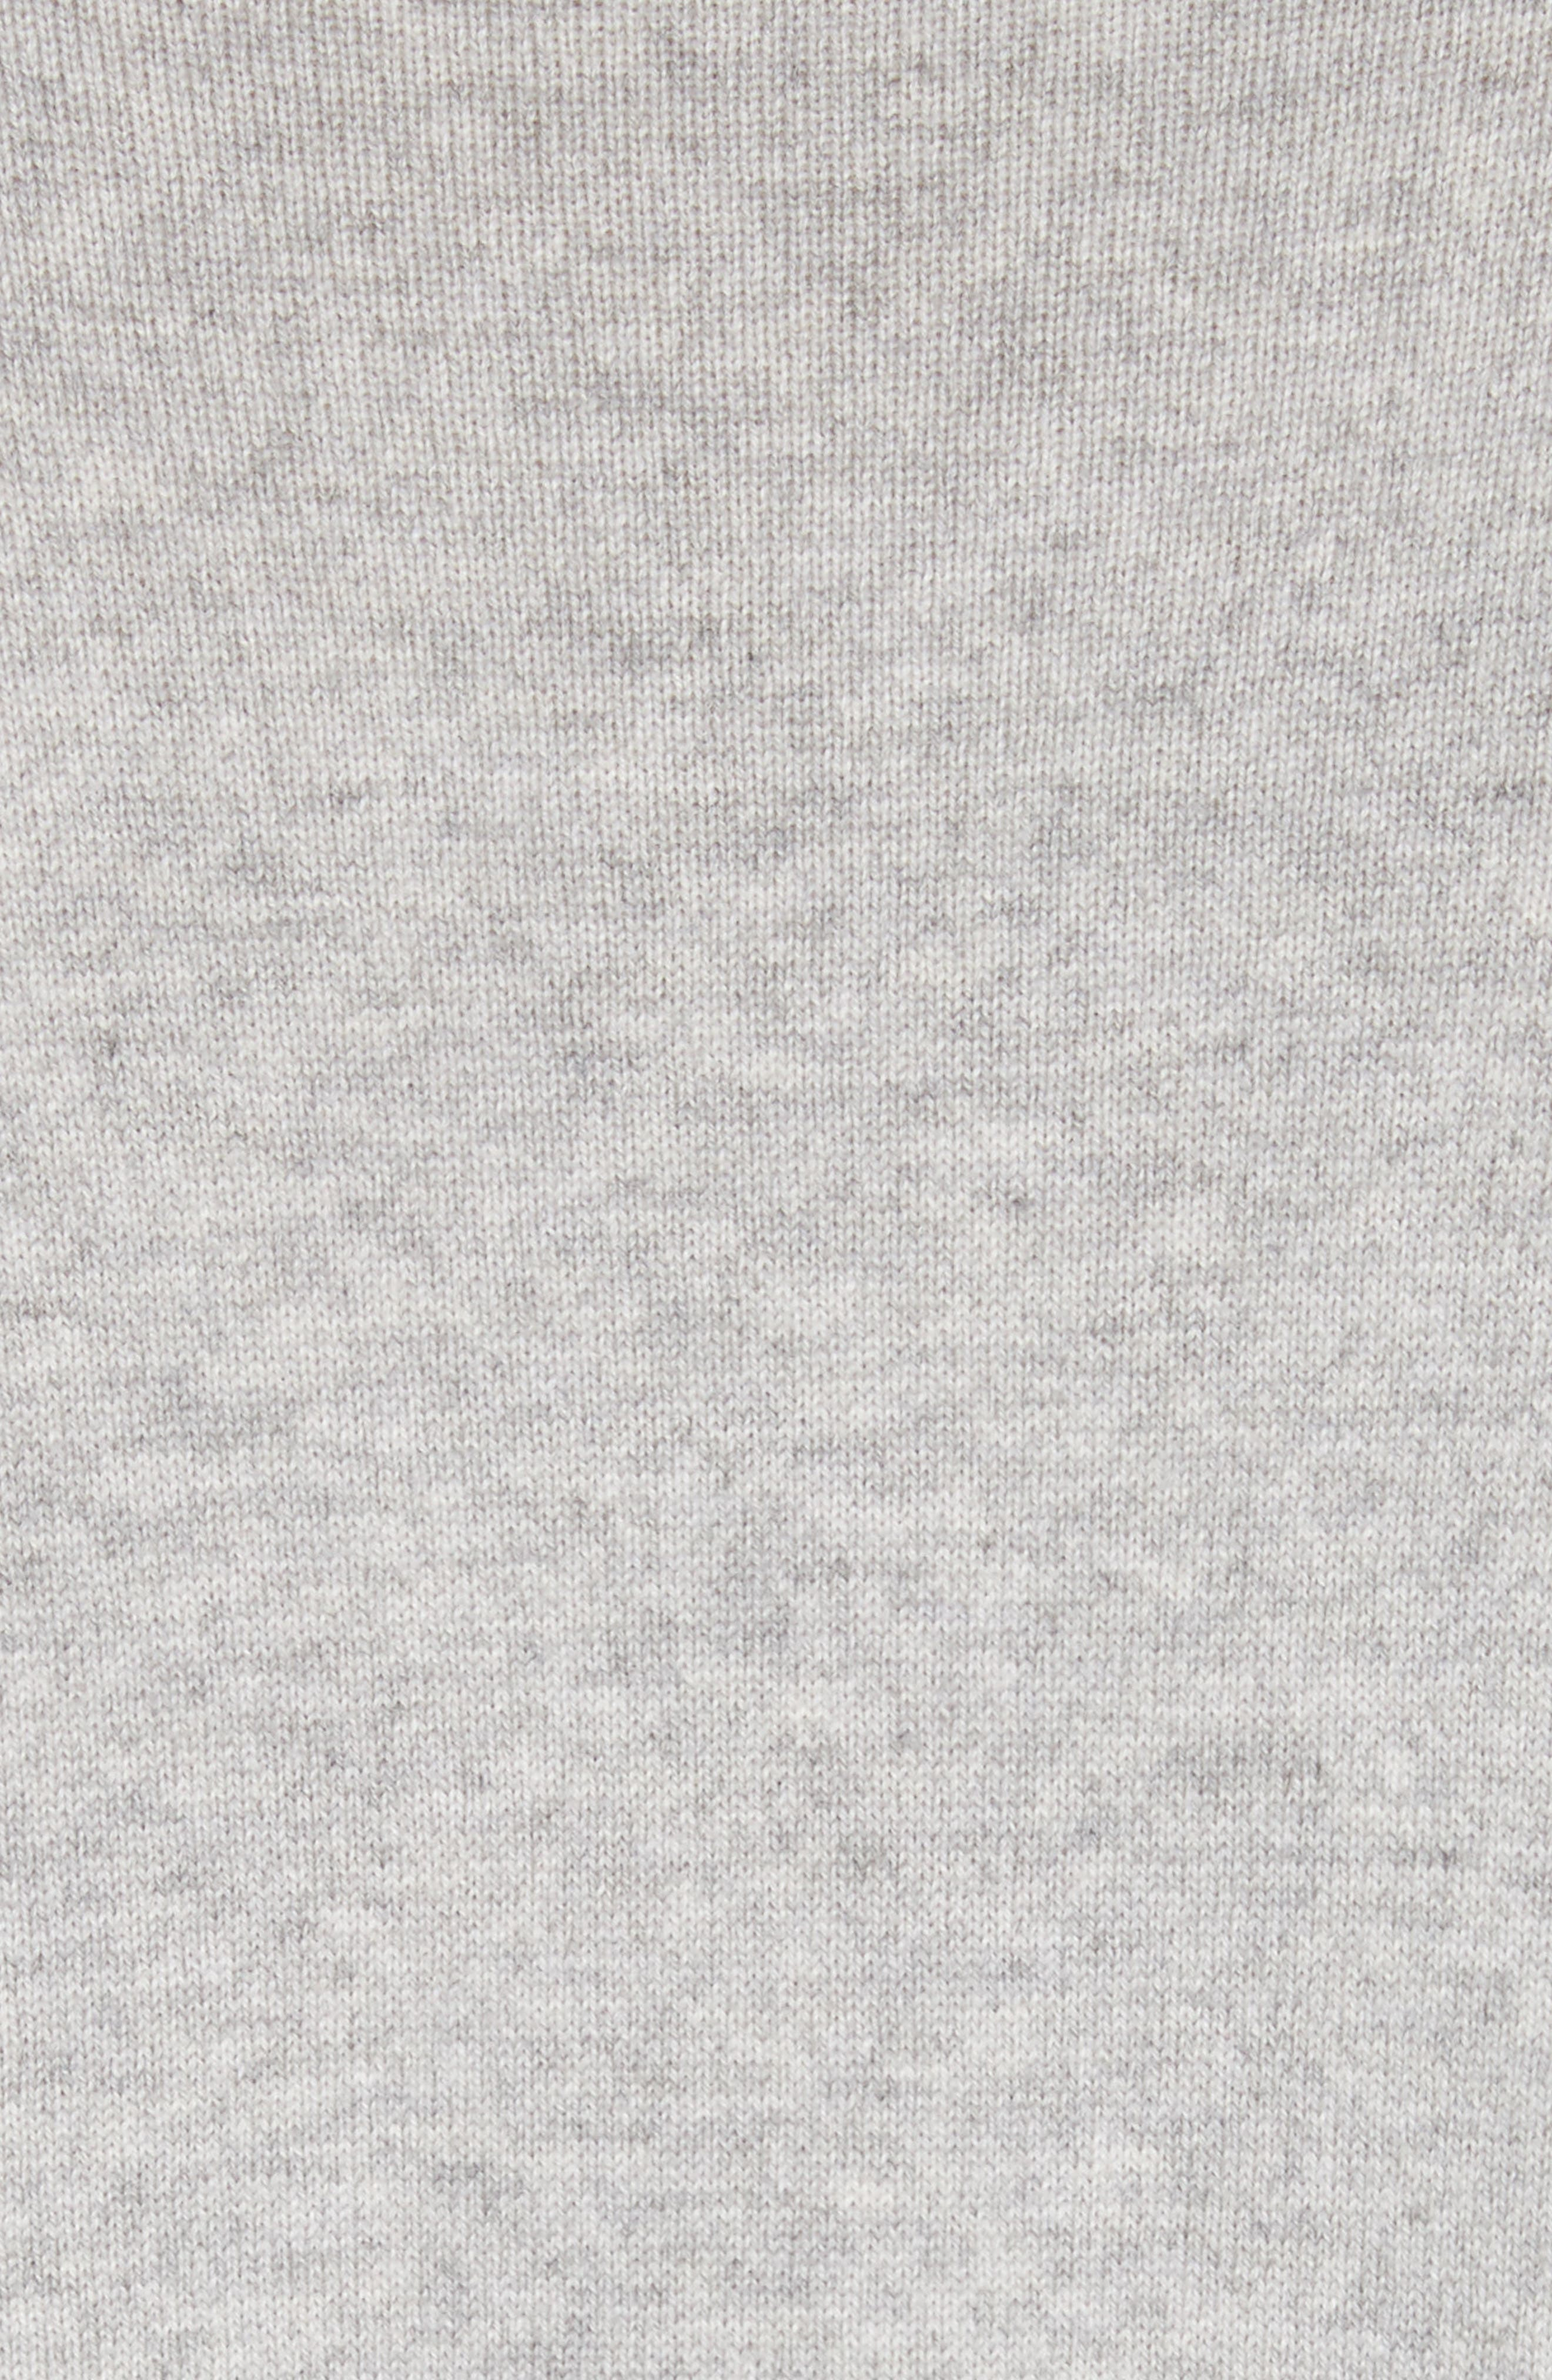 Cashmere Draped Pullover,                             Alternate thumbnail 6, color,                             PEARL GREY MELANGE